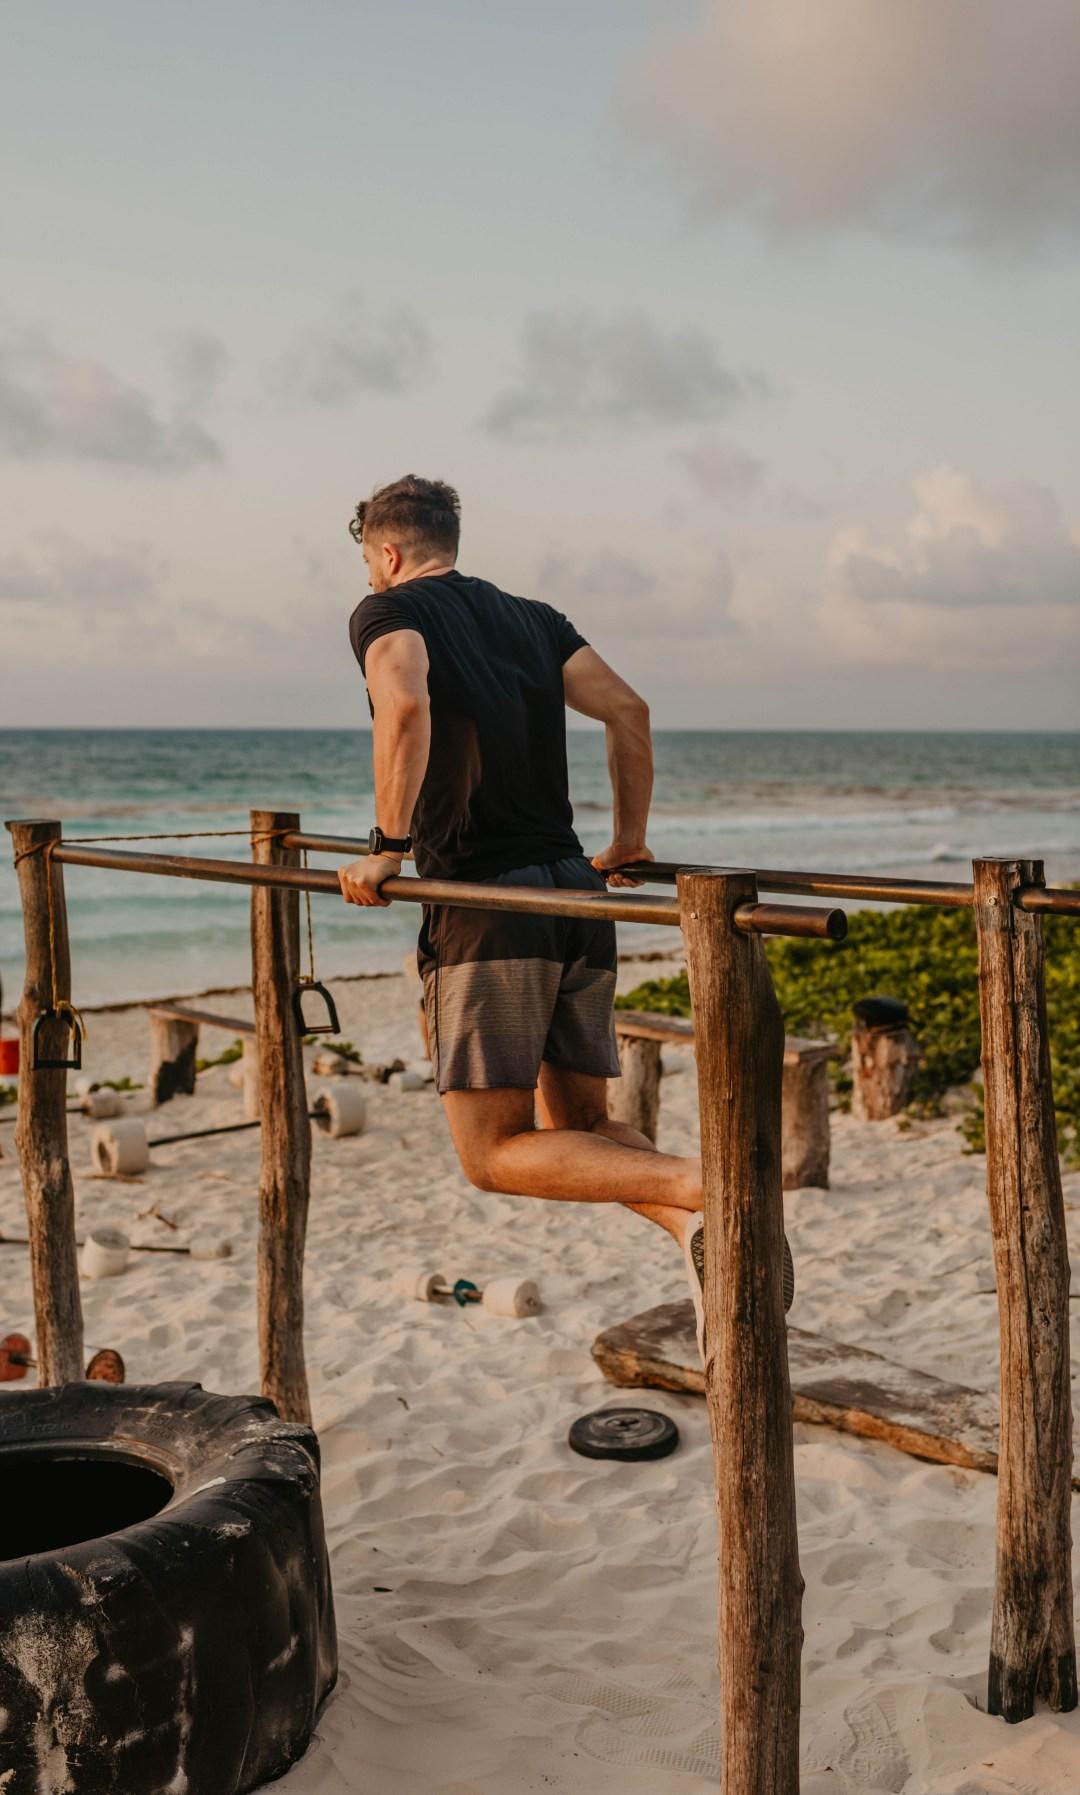 Efficient workout for adventure athletes.